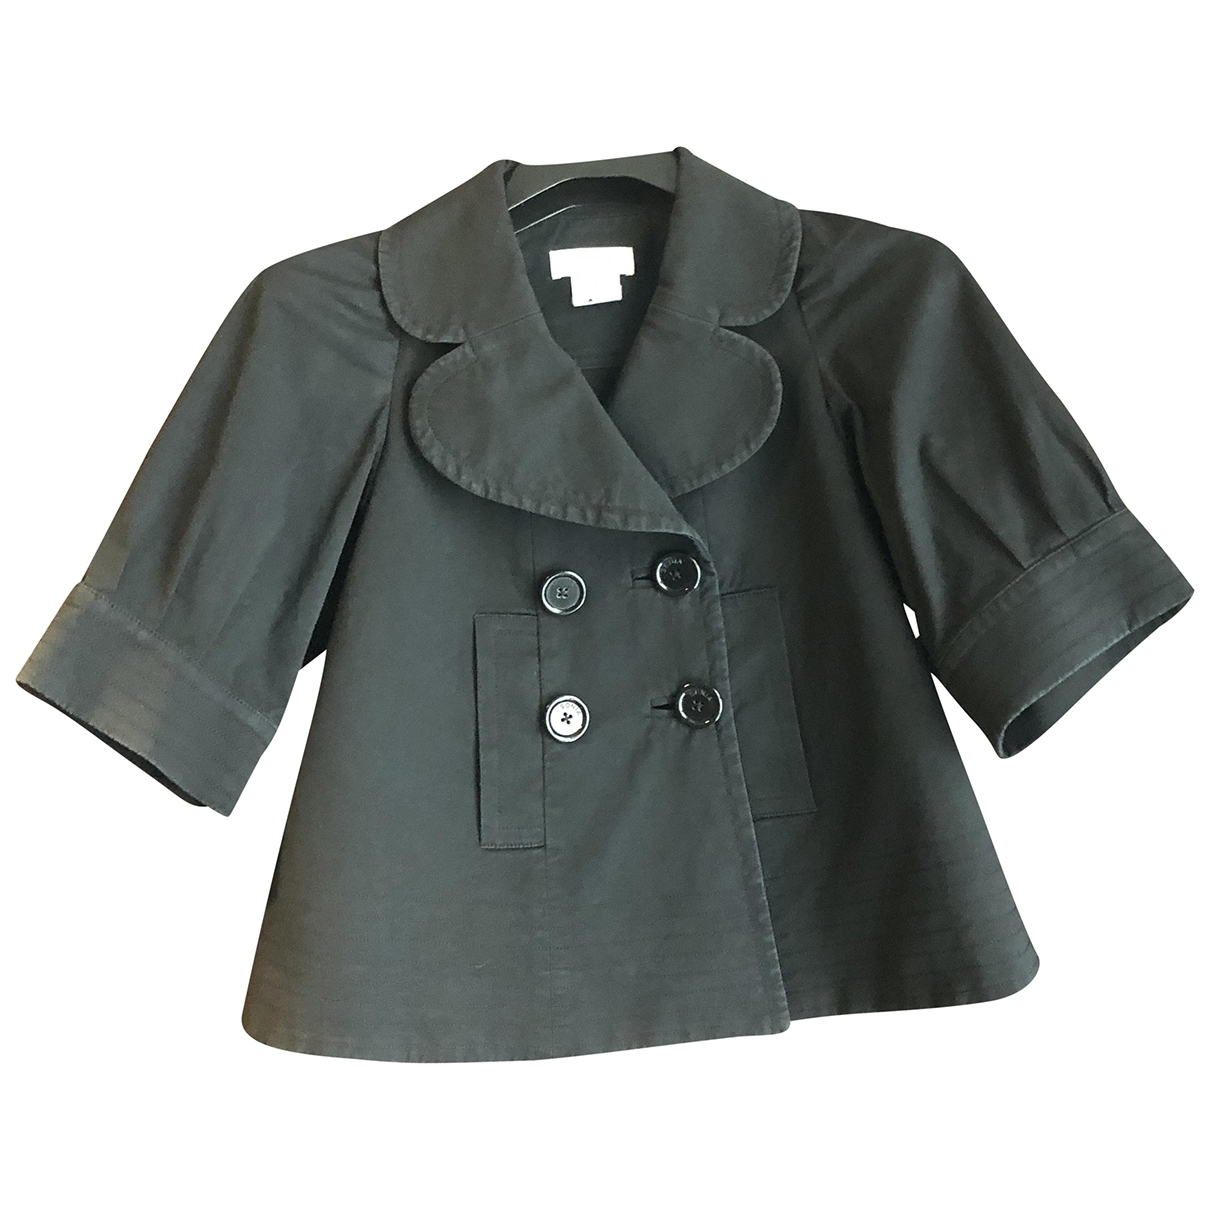 Sonia By Sonia Rykiel - Veste   pour femme en coton - noir